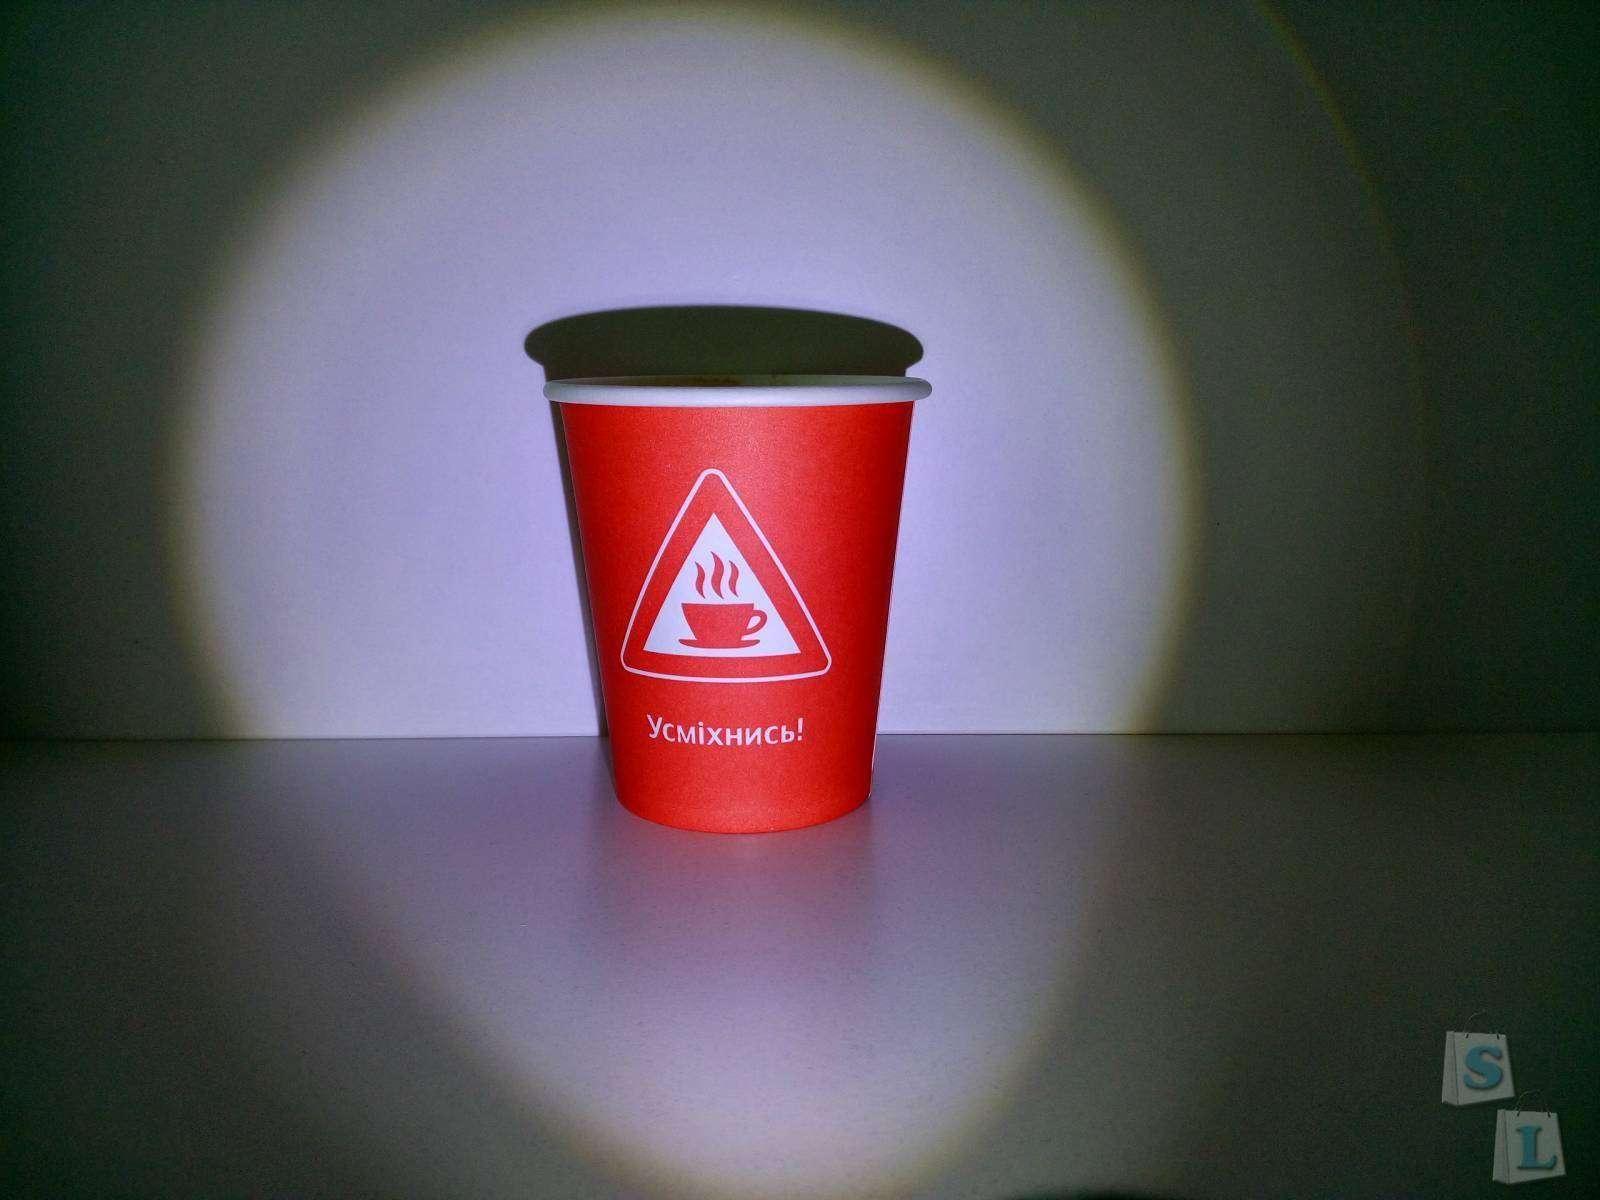 GearBest: Карманный фонарик камуфляжной раскраски SK68 XPE Q5 400LM 5500K